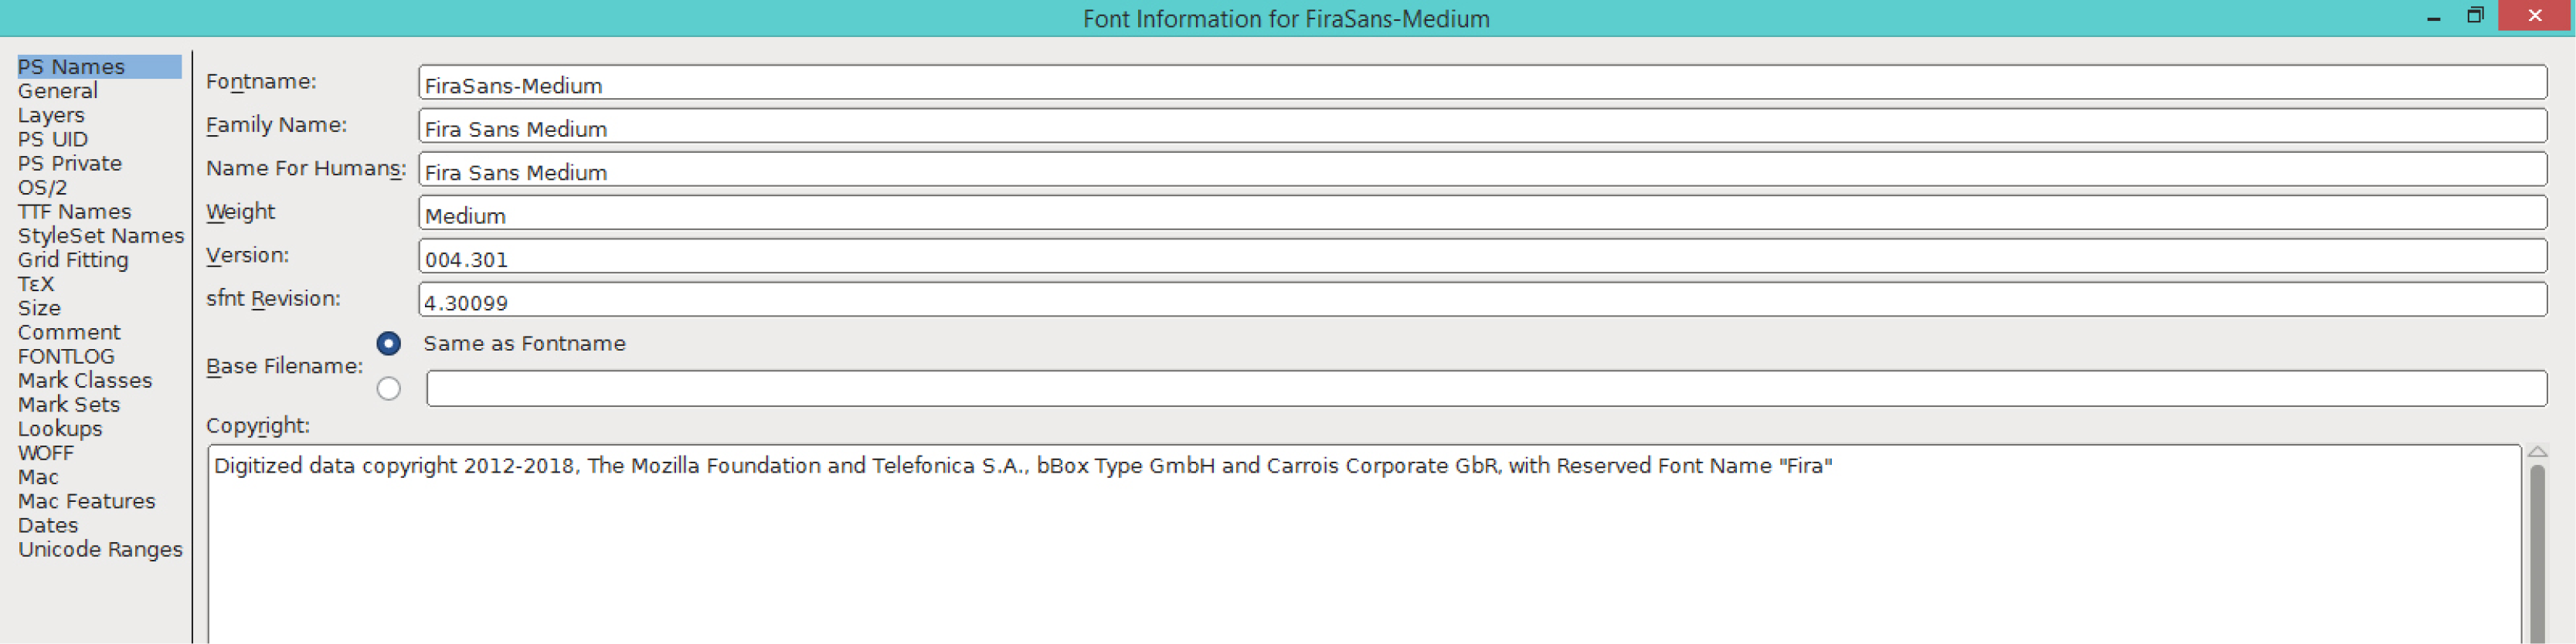 Fira Sans Medium (PS)